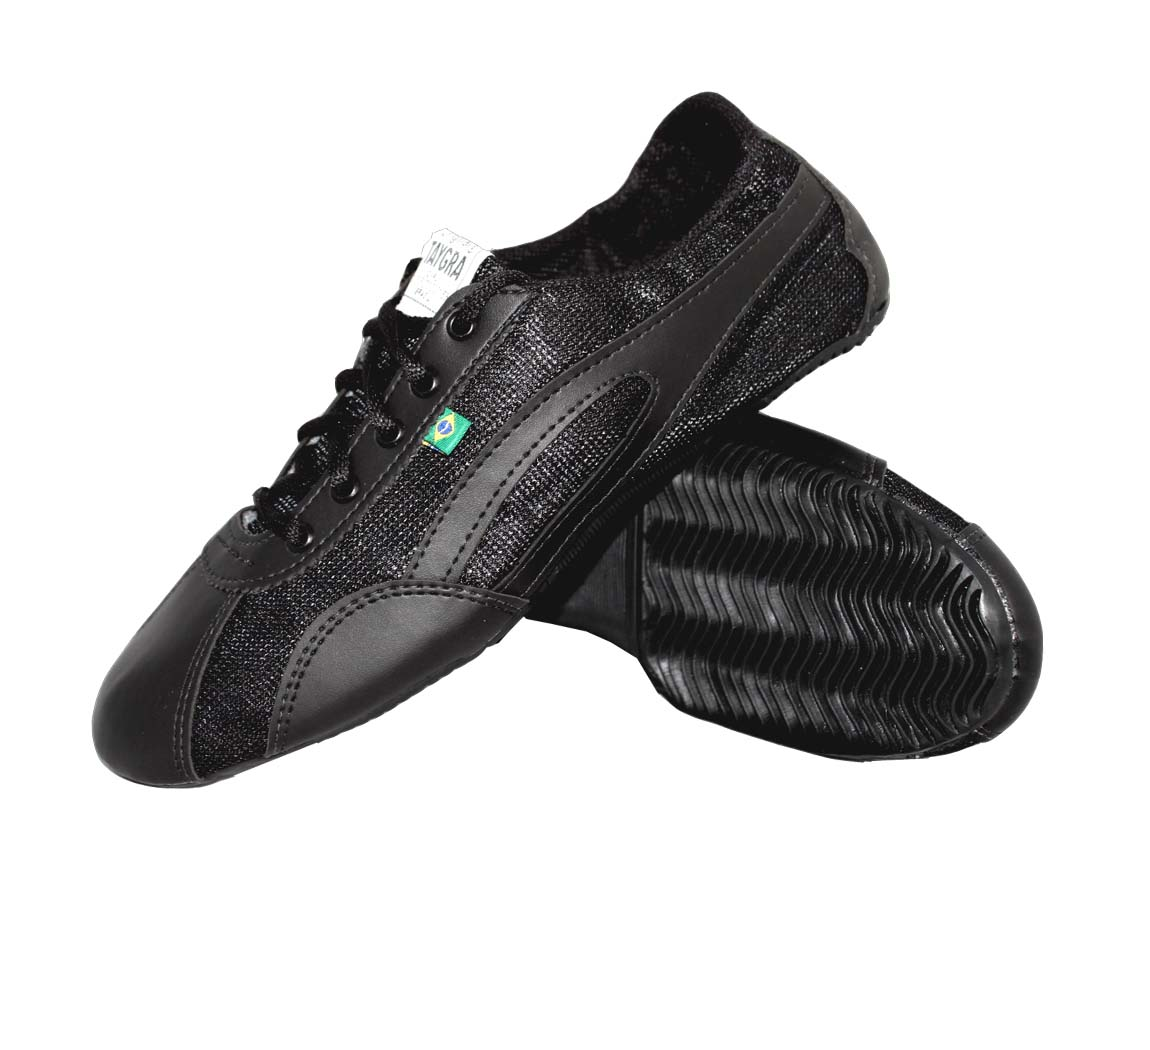 basket noire chaussure cologique taygra. Black Bedroom Furniture Sets. Home Design Ideas